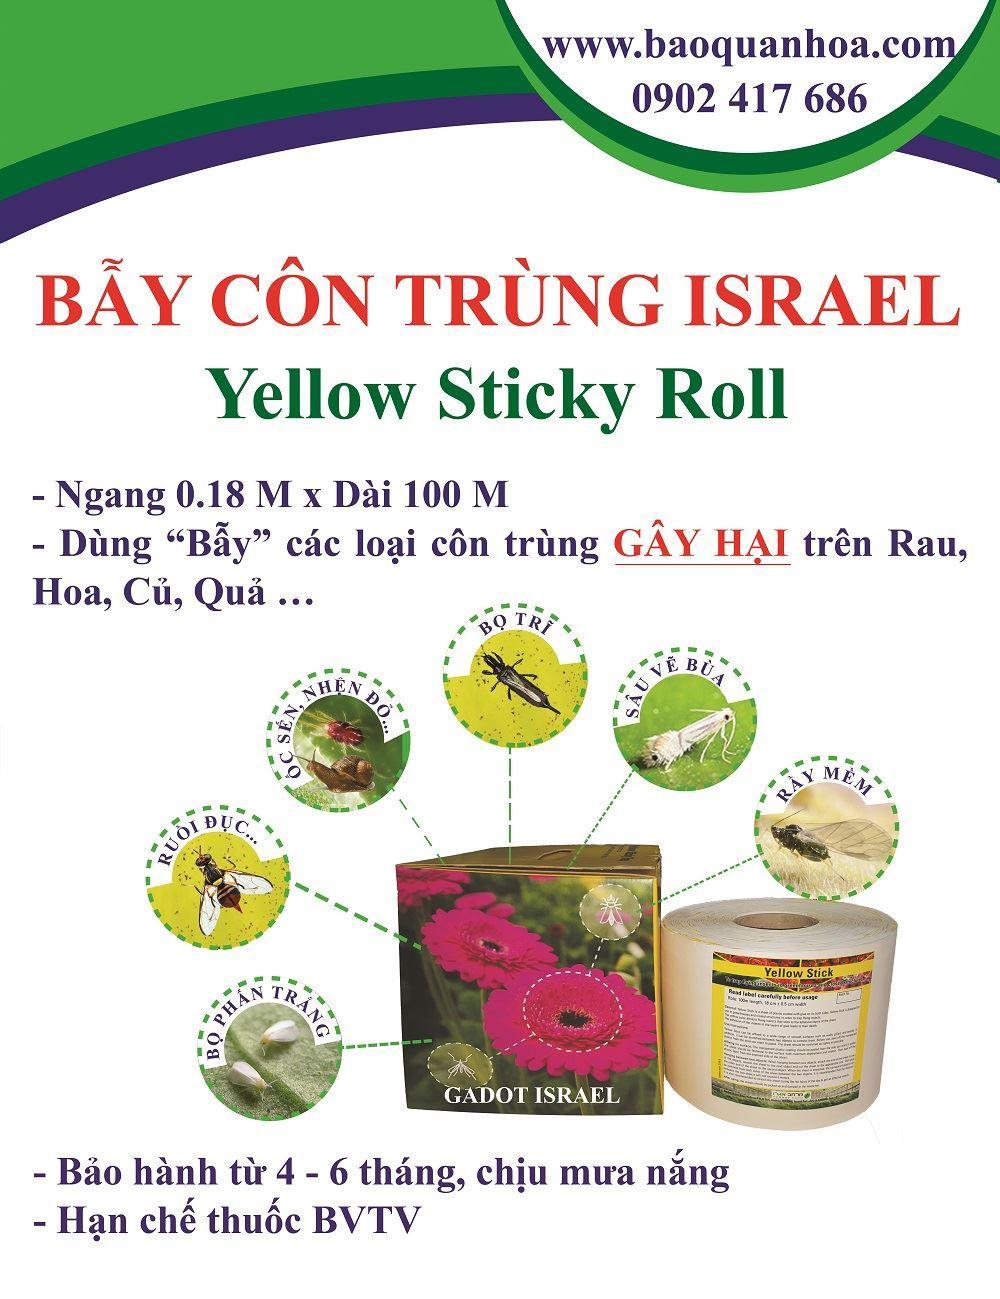 keo-bay-ruoi-duc-trai-israel 2